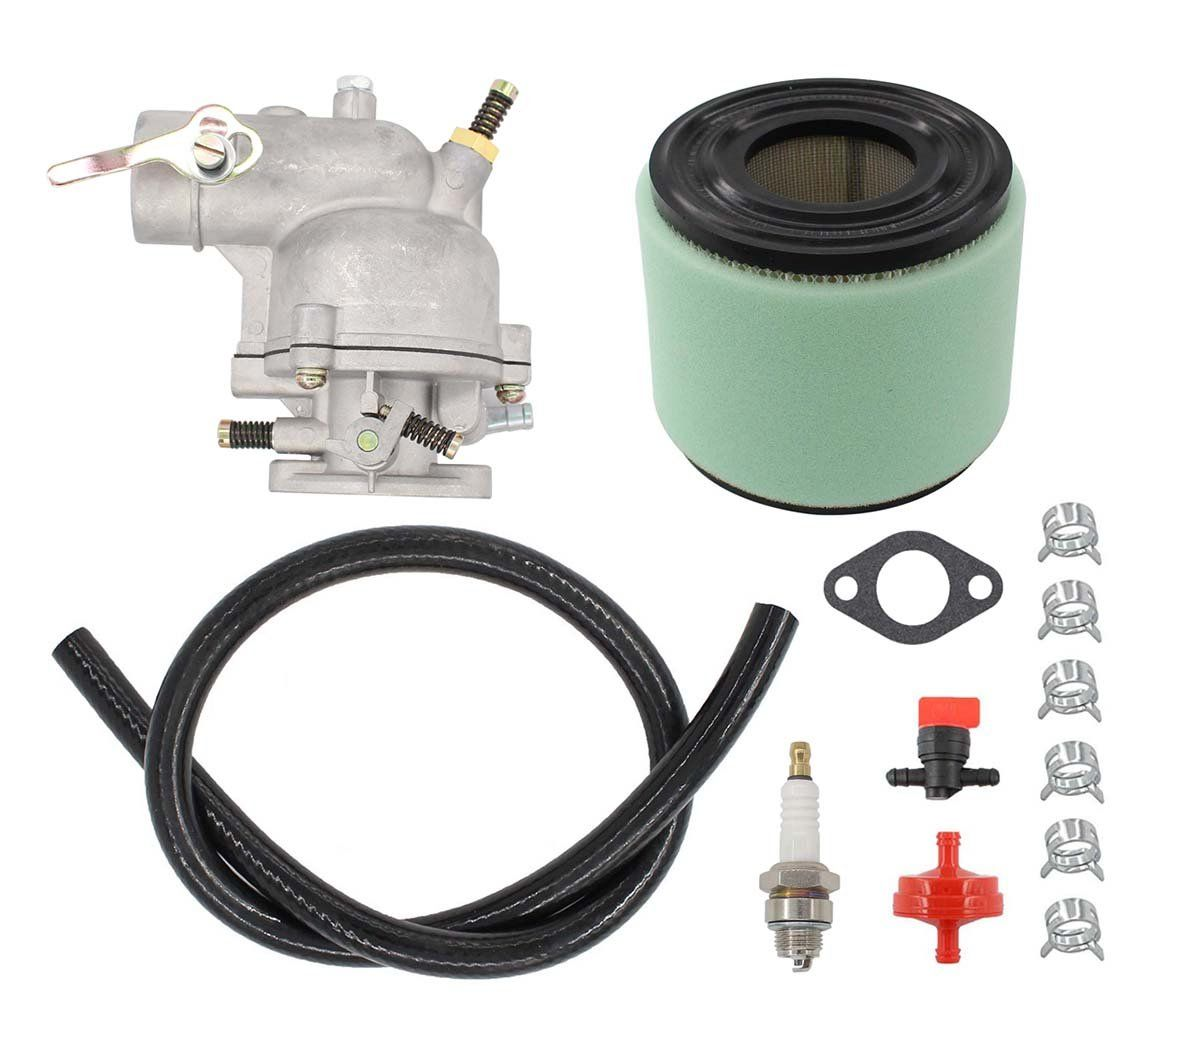 medium resolution of carburetor air filter fuel hose shut off valve for briggs and stratton 390323 394228 299169 7